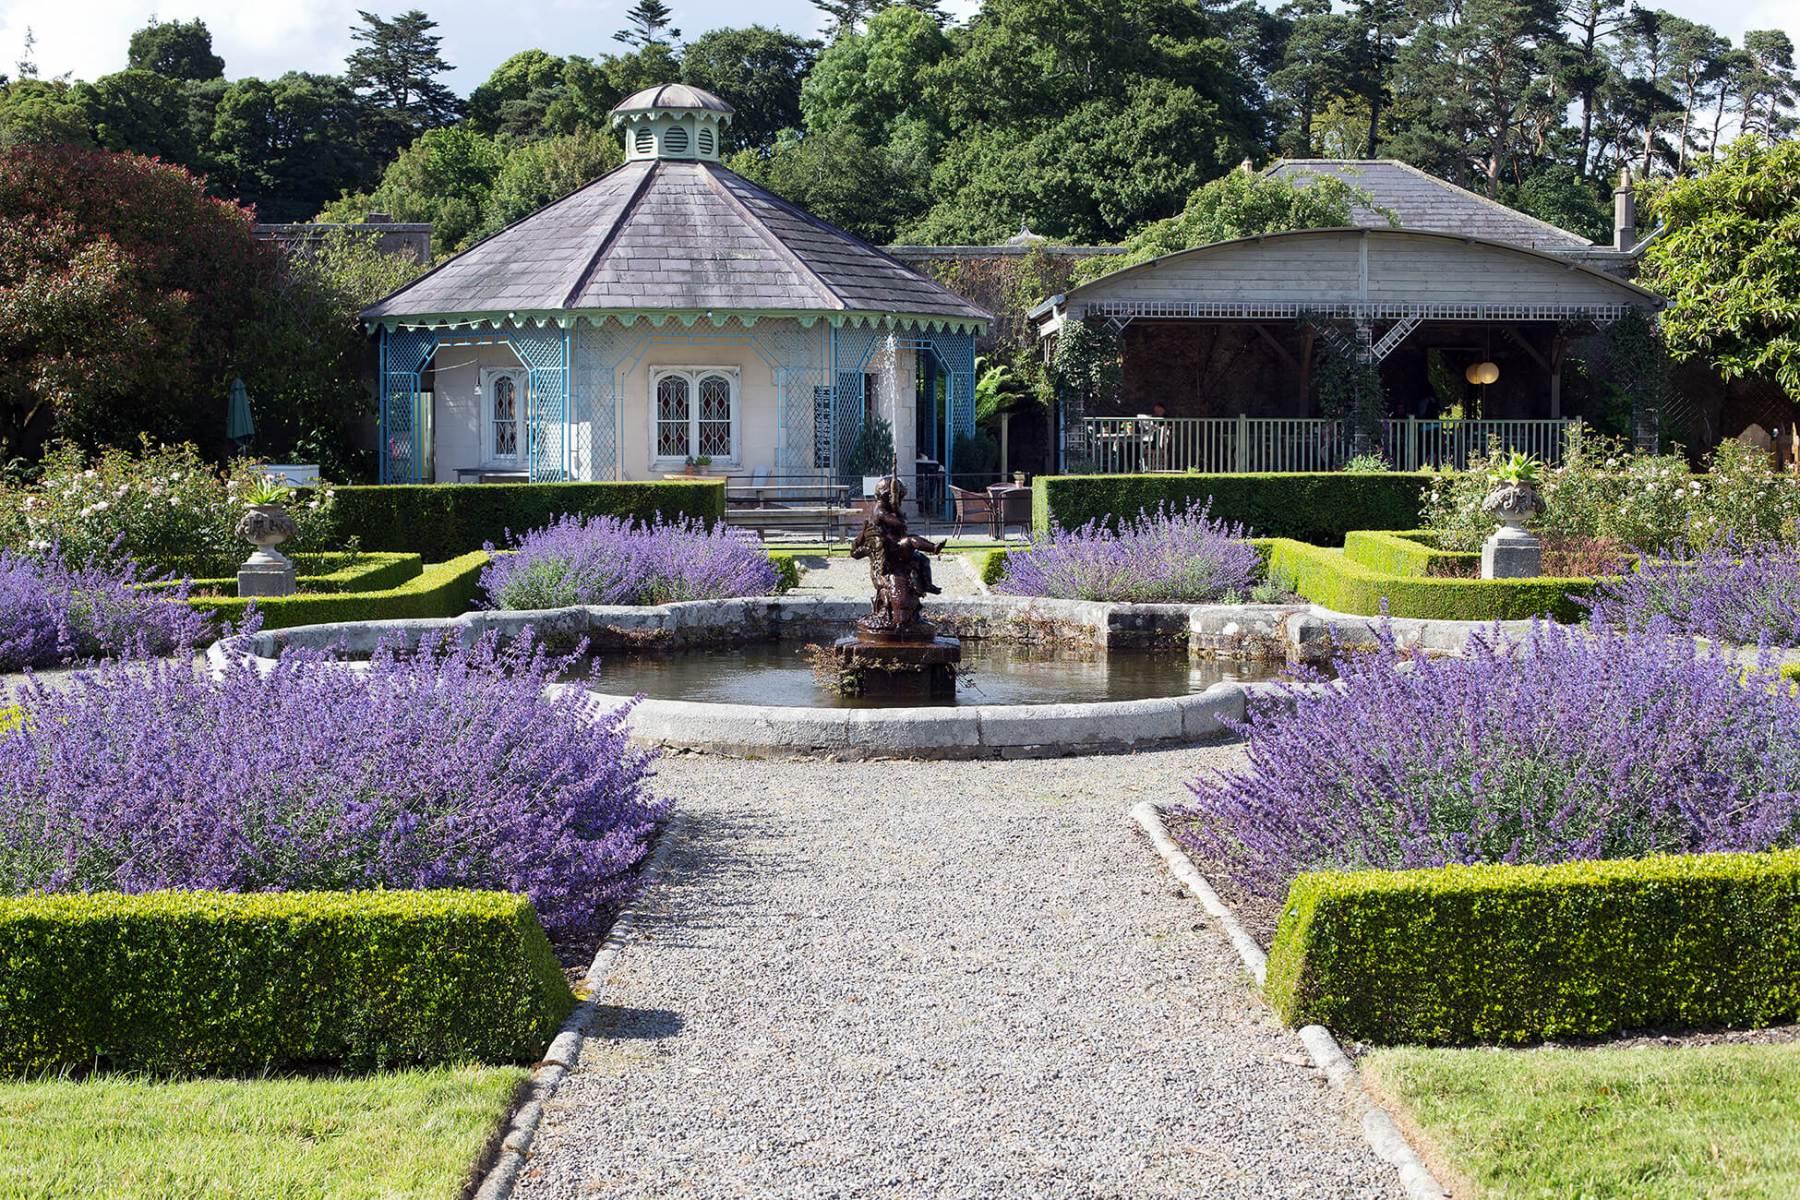 Garden-room-pond-fountain